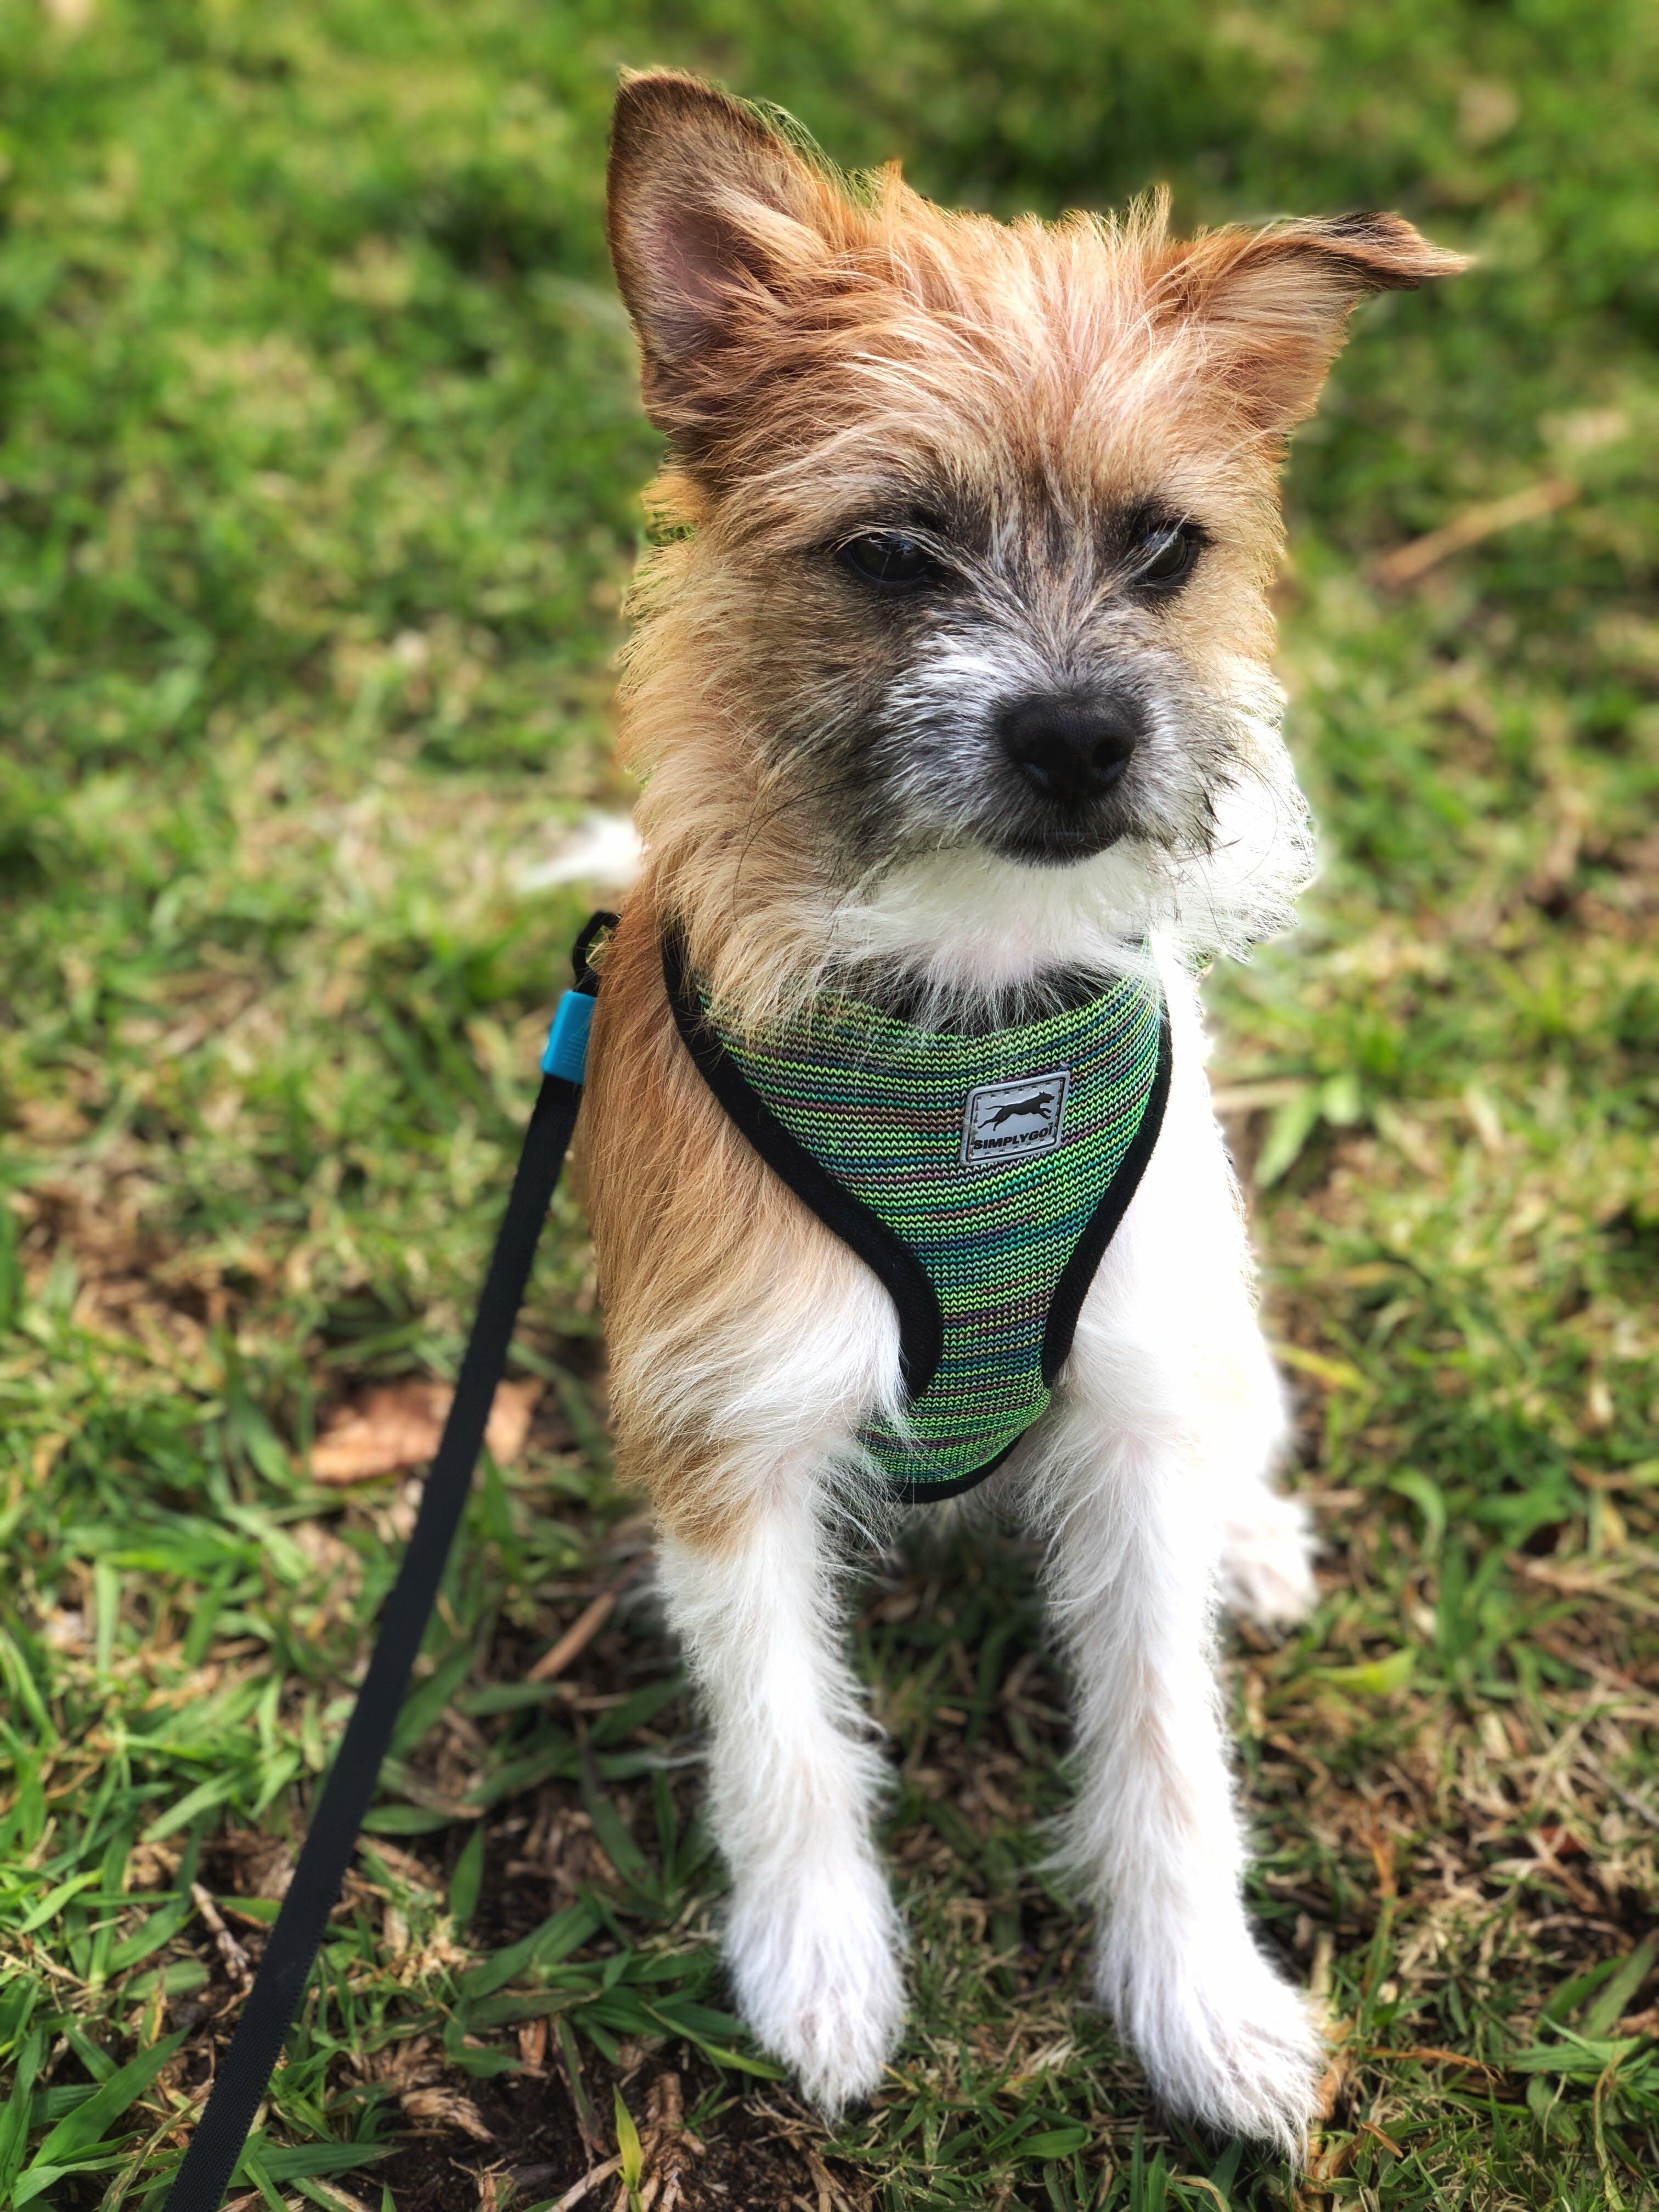 Kostenloses Stock Foto zu #dog #animal #morkie #cute #grass #park #pet, #portrait #puppy #canine